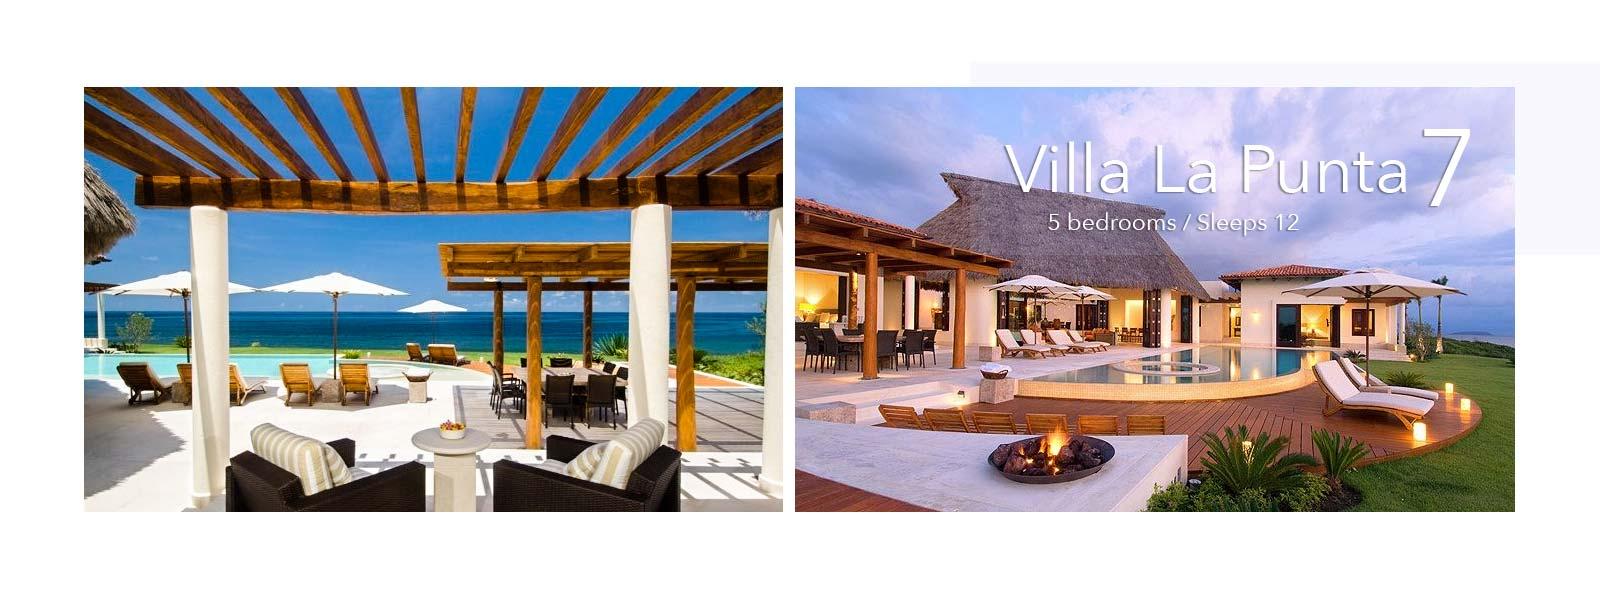 Villa la Punta 7 - La Punta Estate - Punta Mita Resort - Riviera Nayarit - Mexico